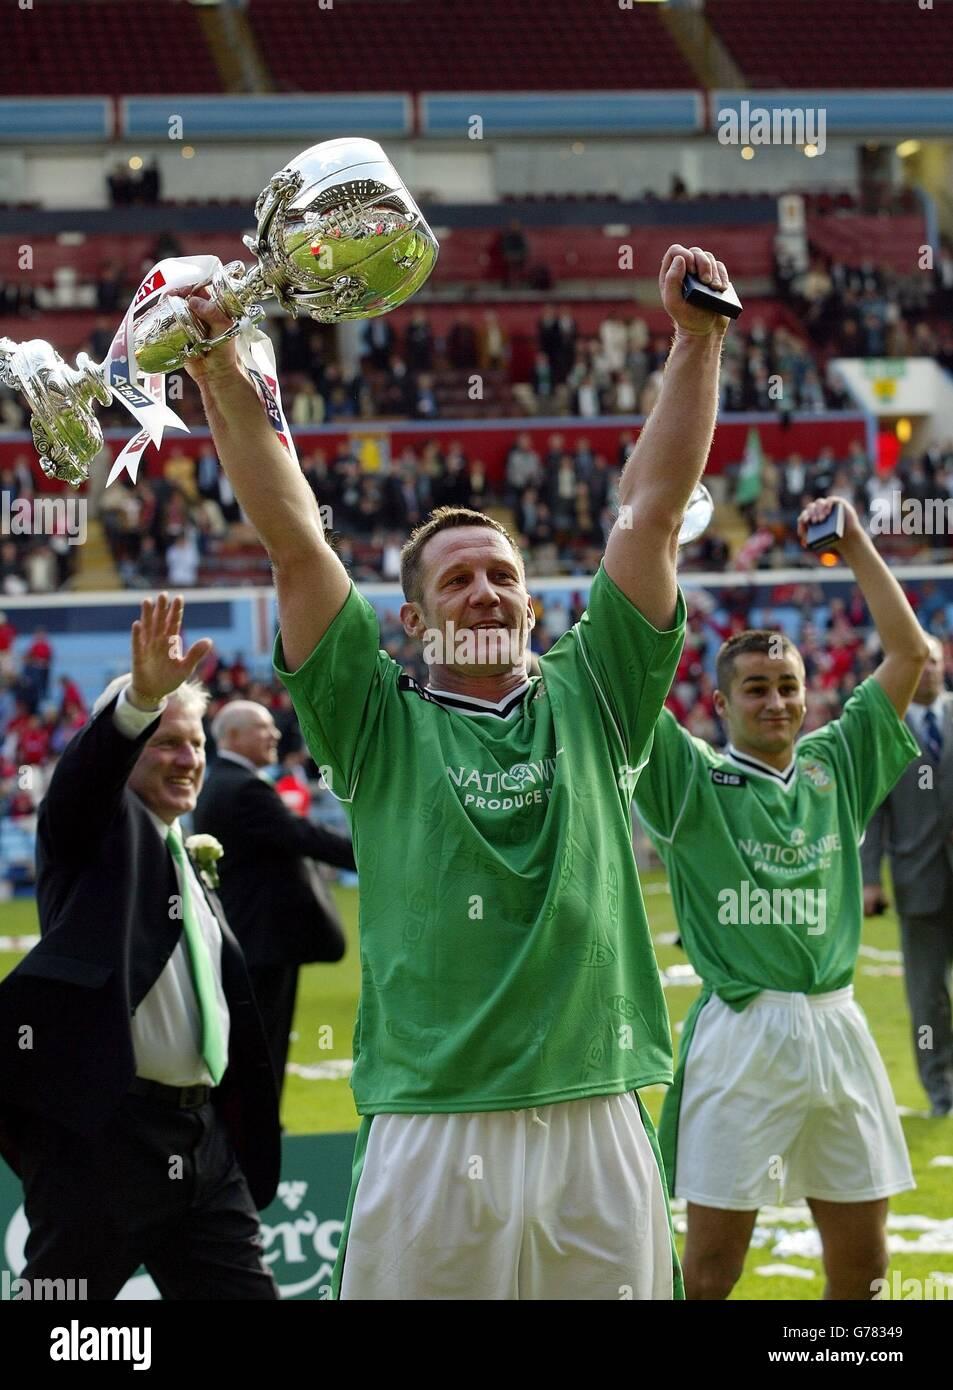 FA Trophy Final - Burscough - Stock Image